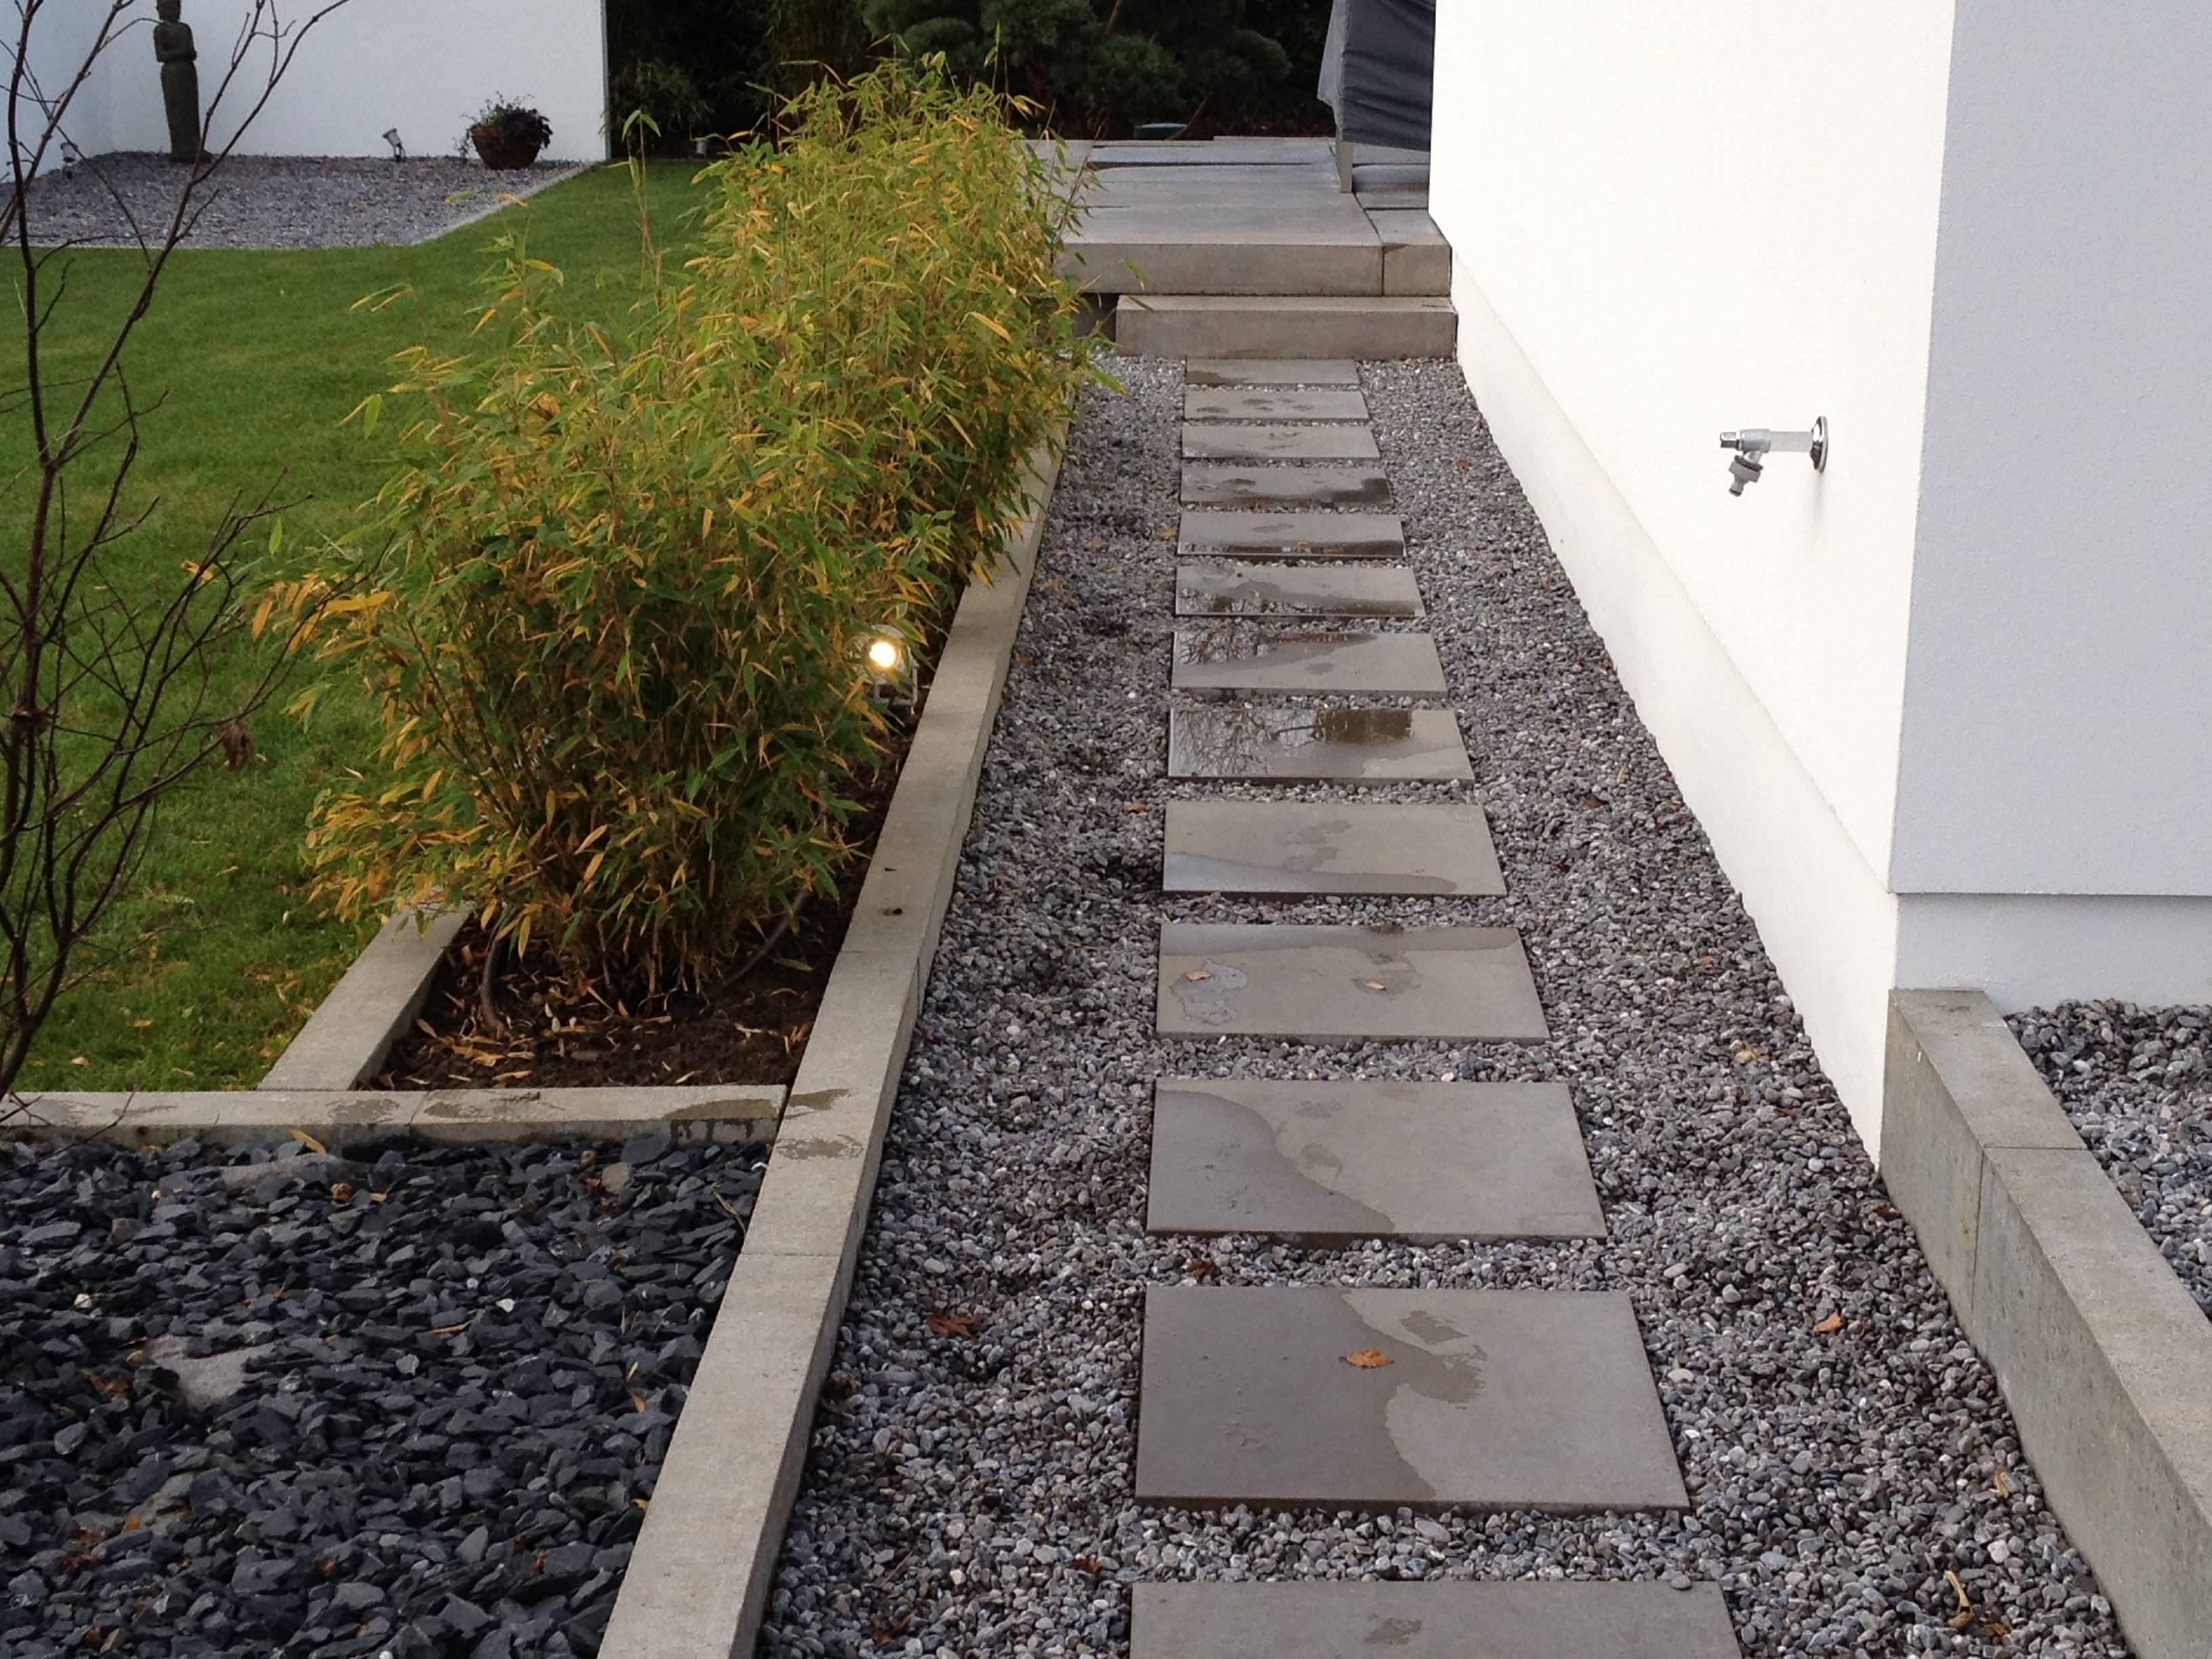 hausgarten bauhaus 1 | righini garten- und landschaftsbau, Garten ideen